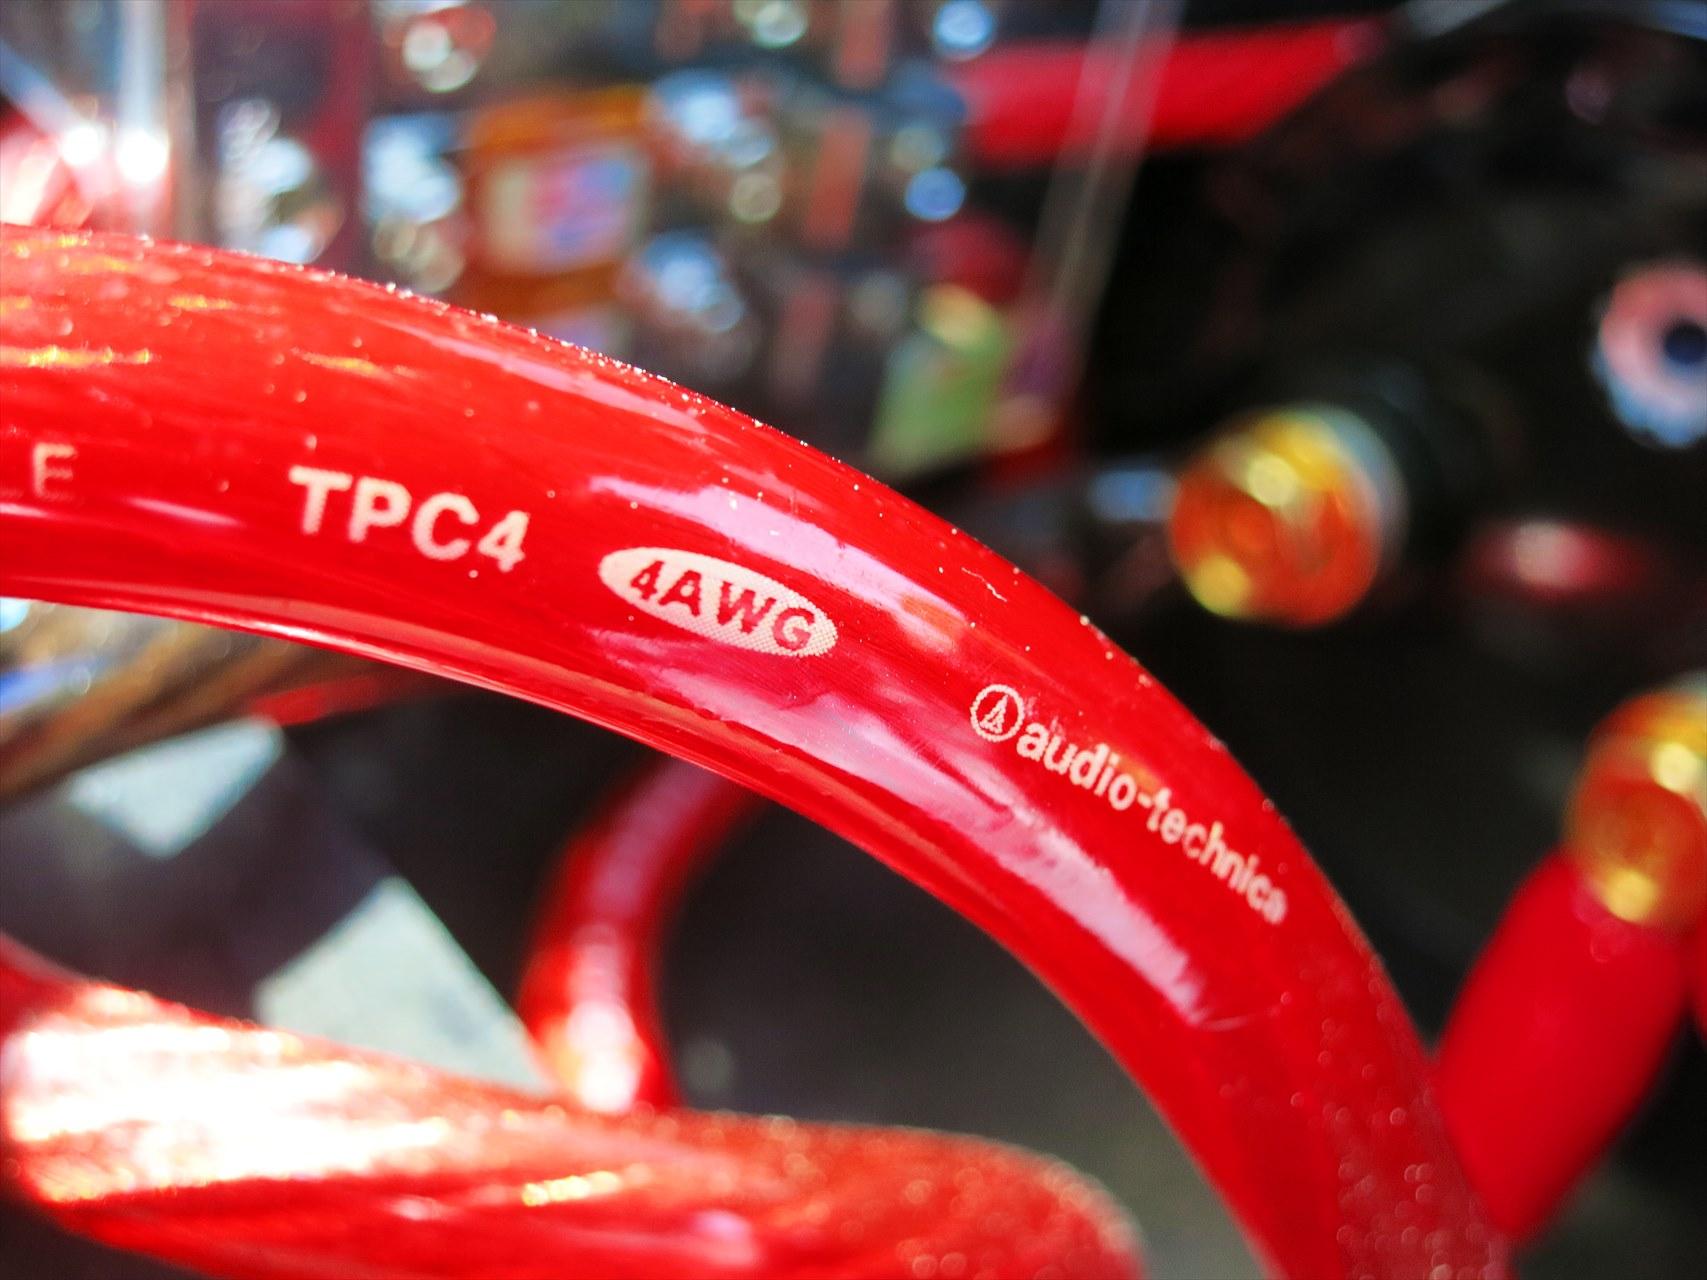 audio-technica TPC4 OFCパワーケーブル